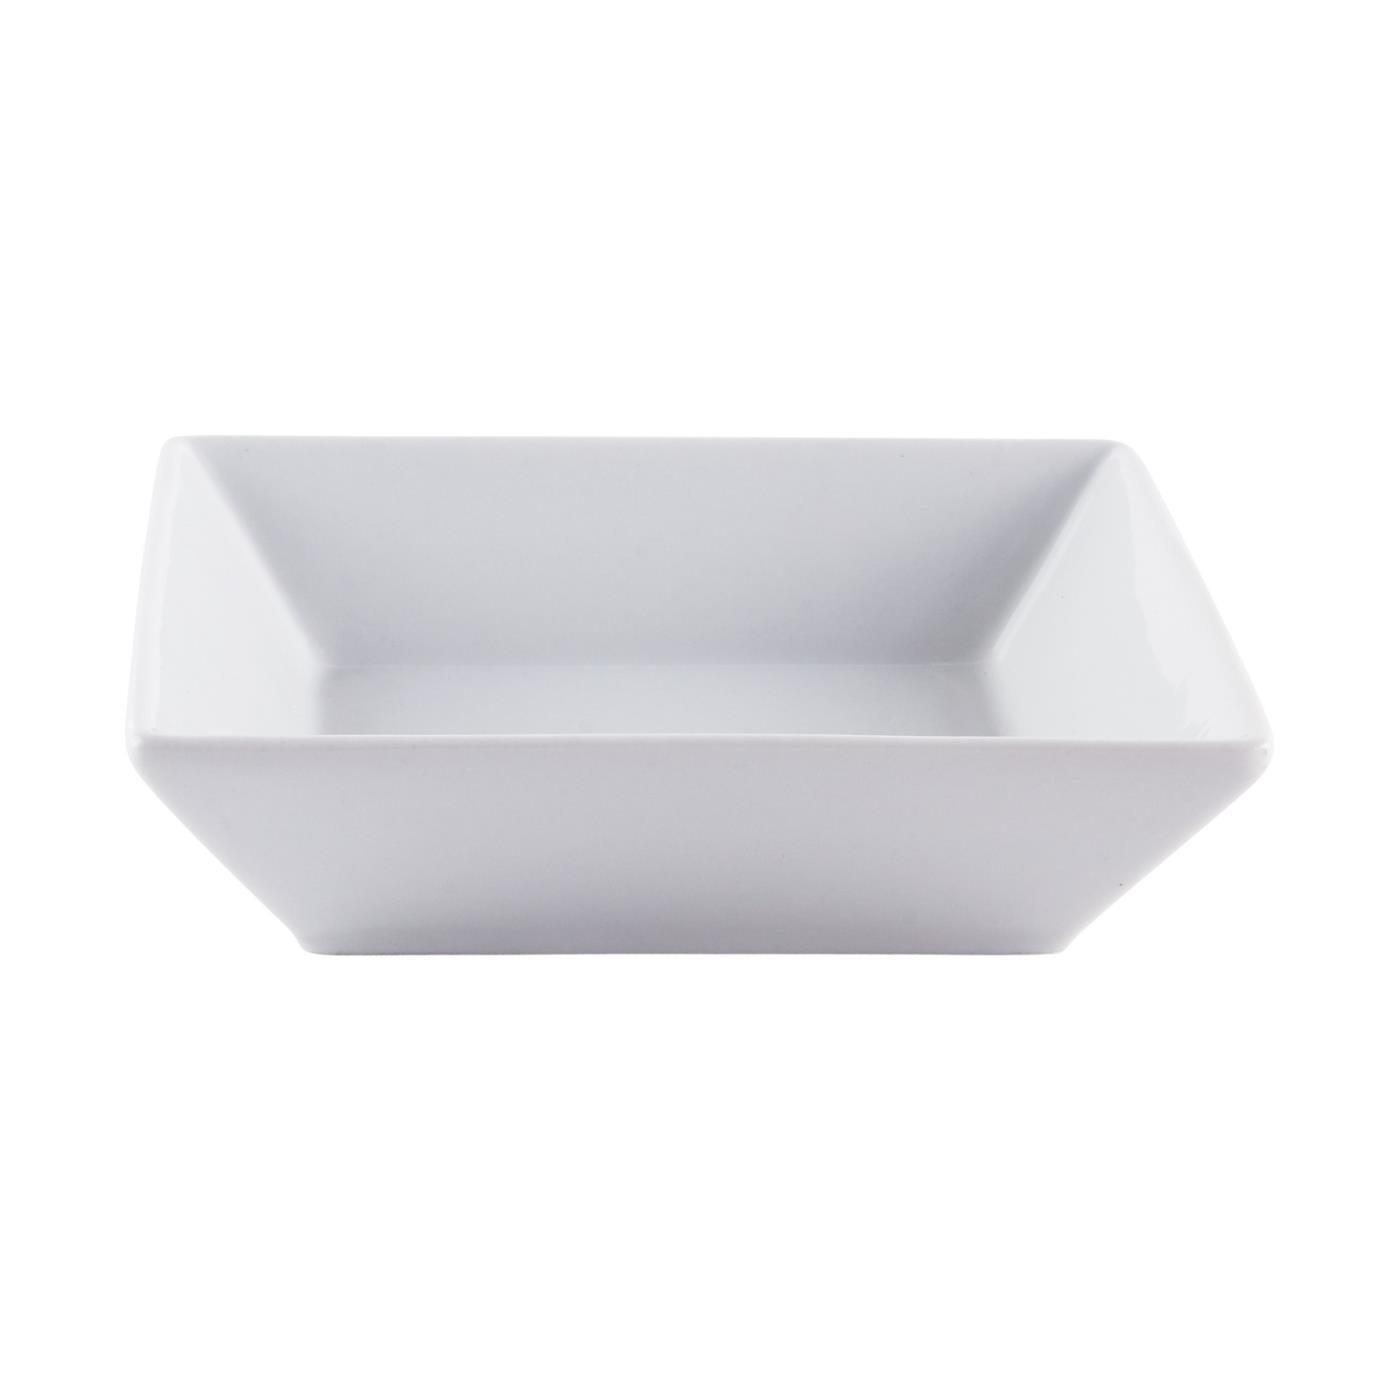 "White Ceramic Square Bowl - 6"" Shallow"